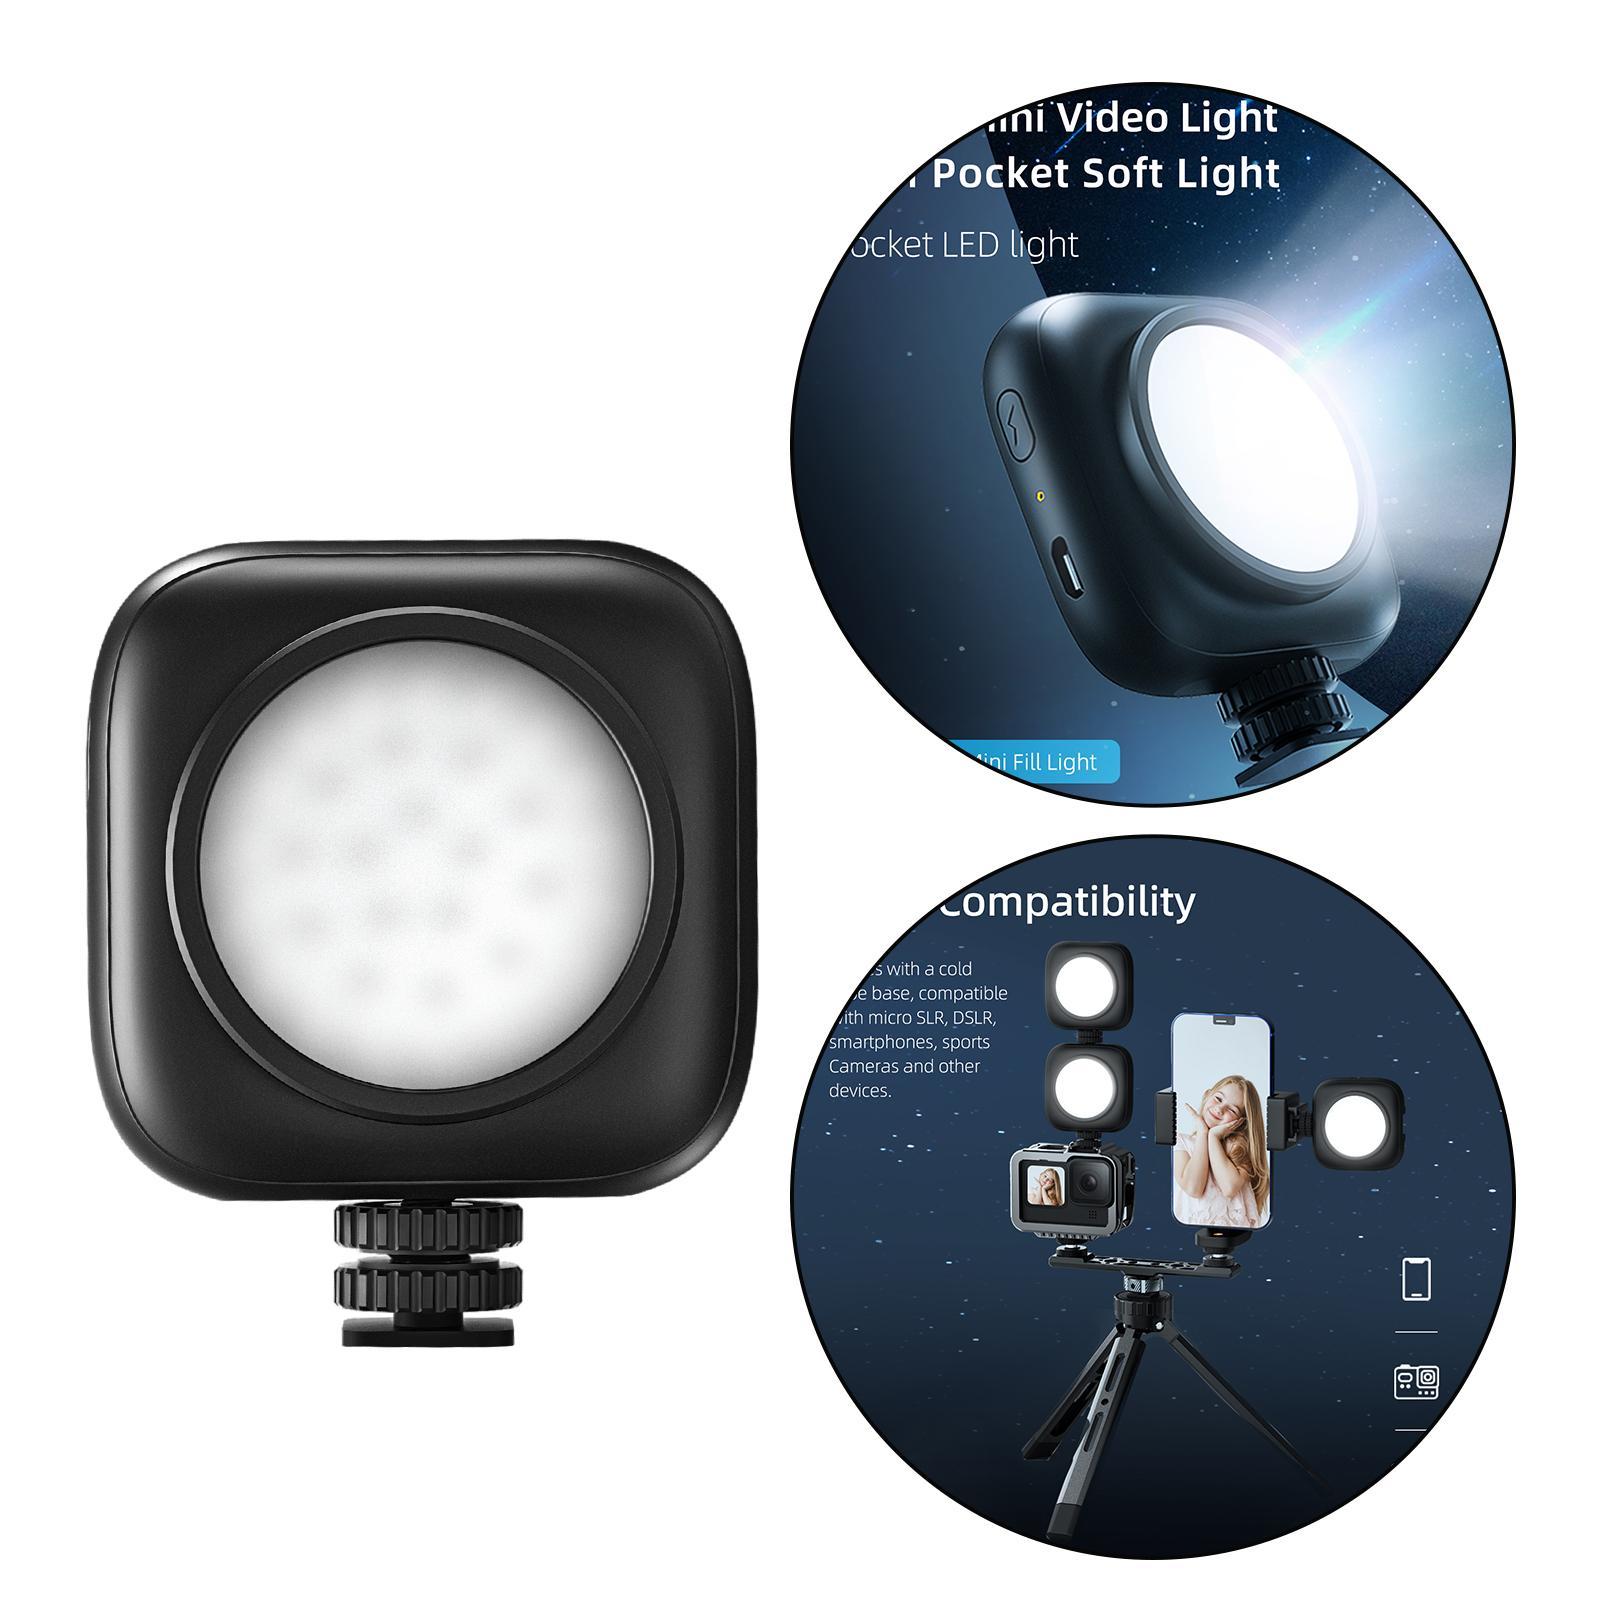 500mAh Portable Adjustable Video Fill Light for Vlog DSLR Camera Mobile